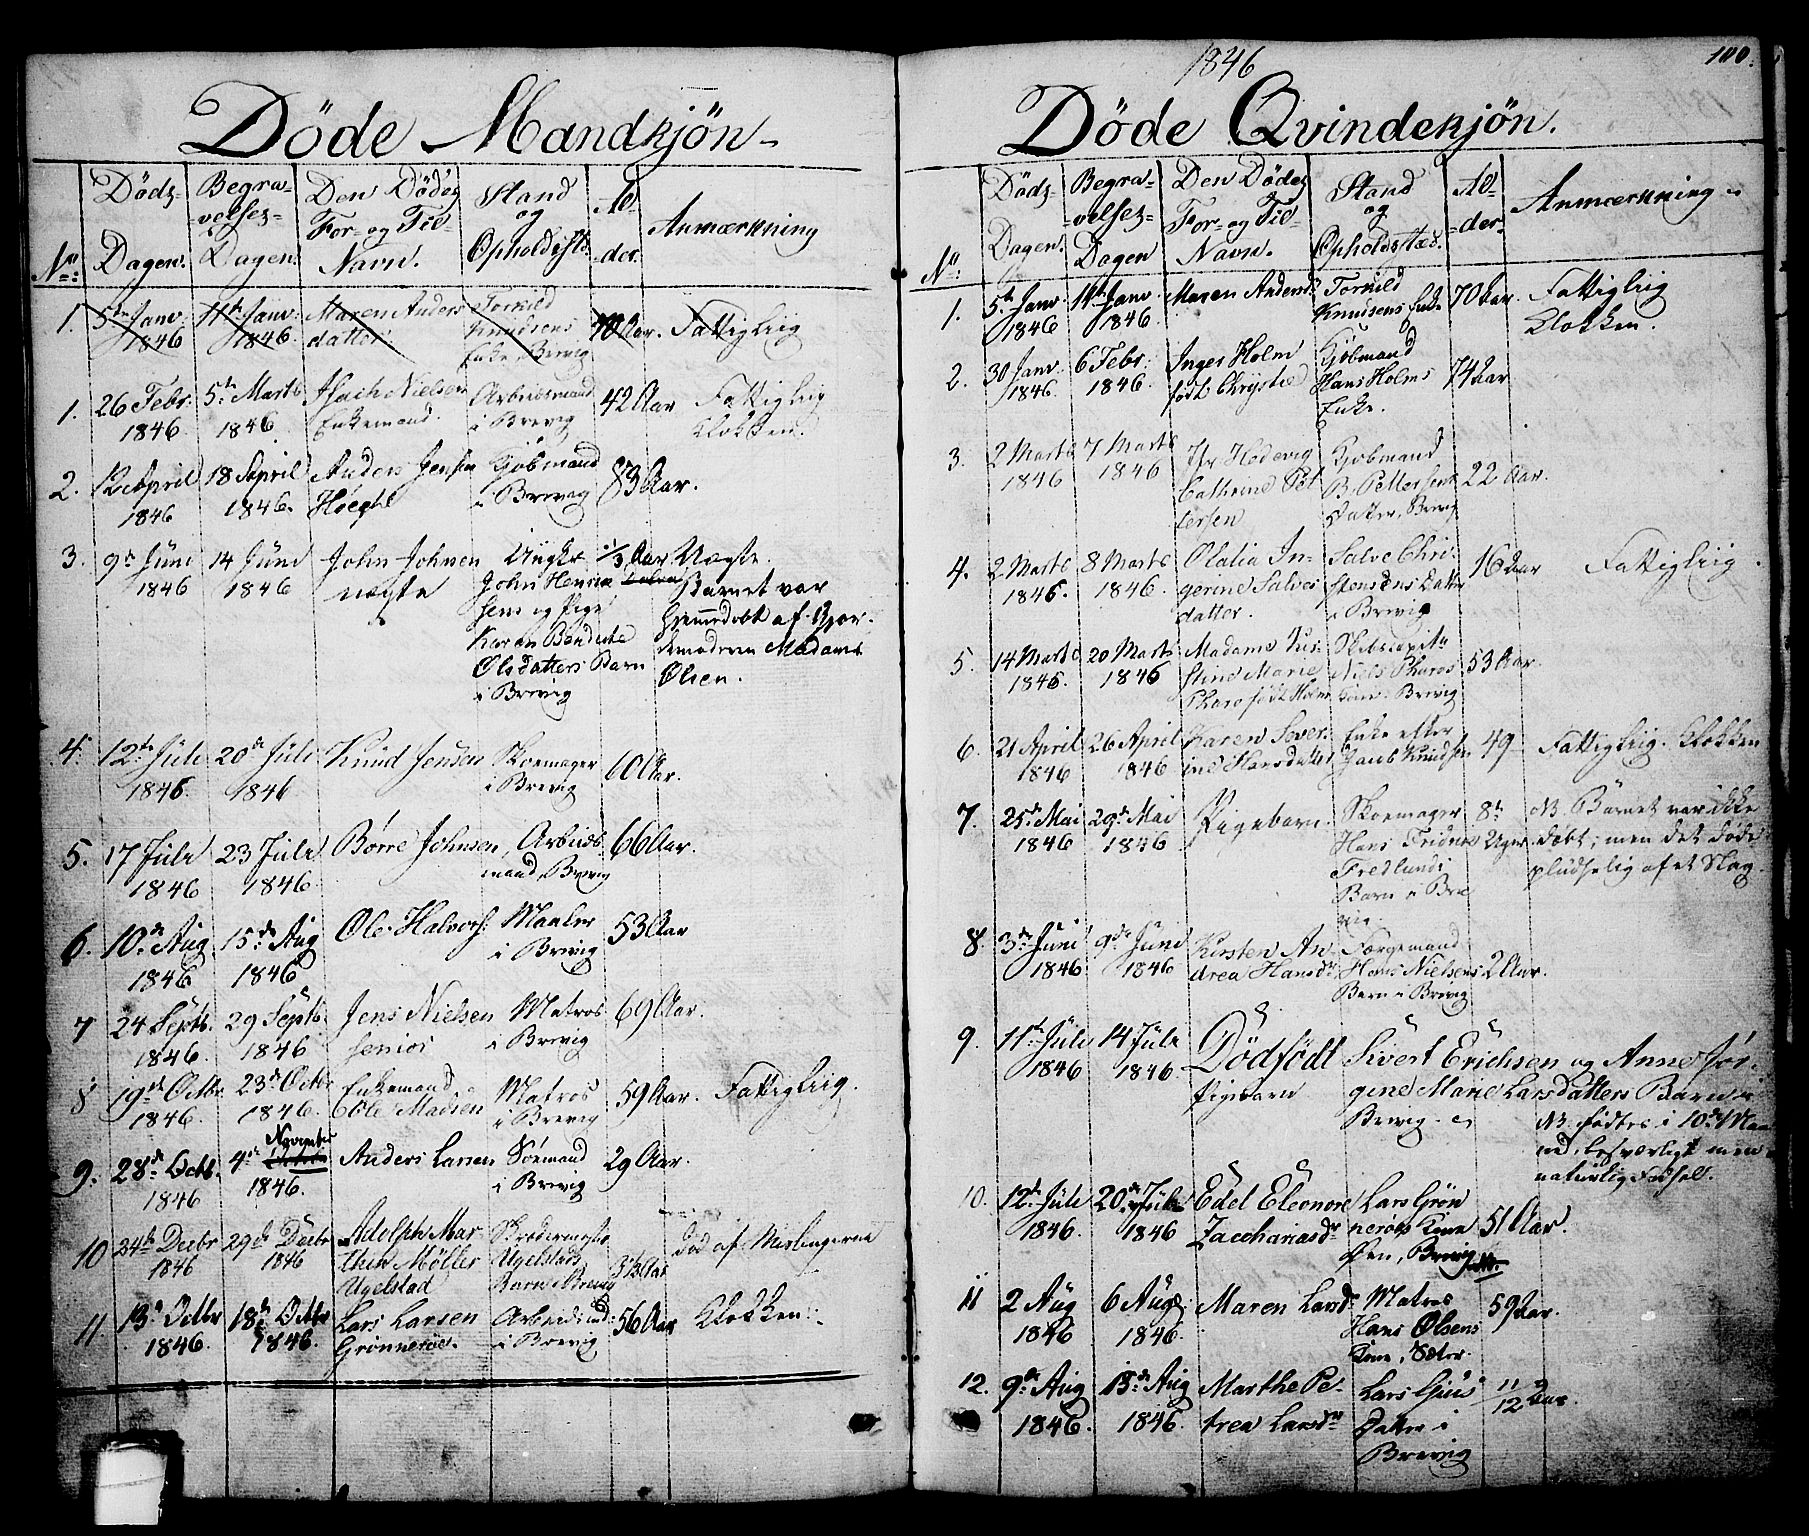 SAKO, Brevik kirkebøker, G/Ga/L0002: Klokkerbok nr. 2, 1846-1865, s. 100